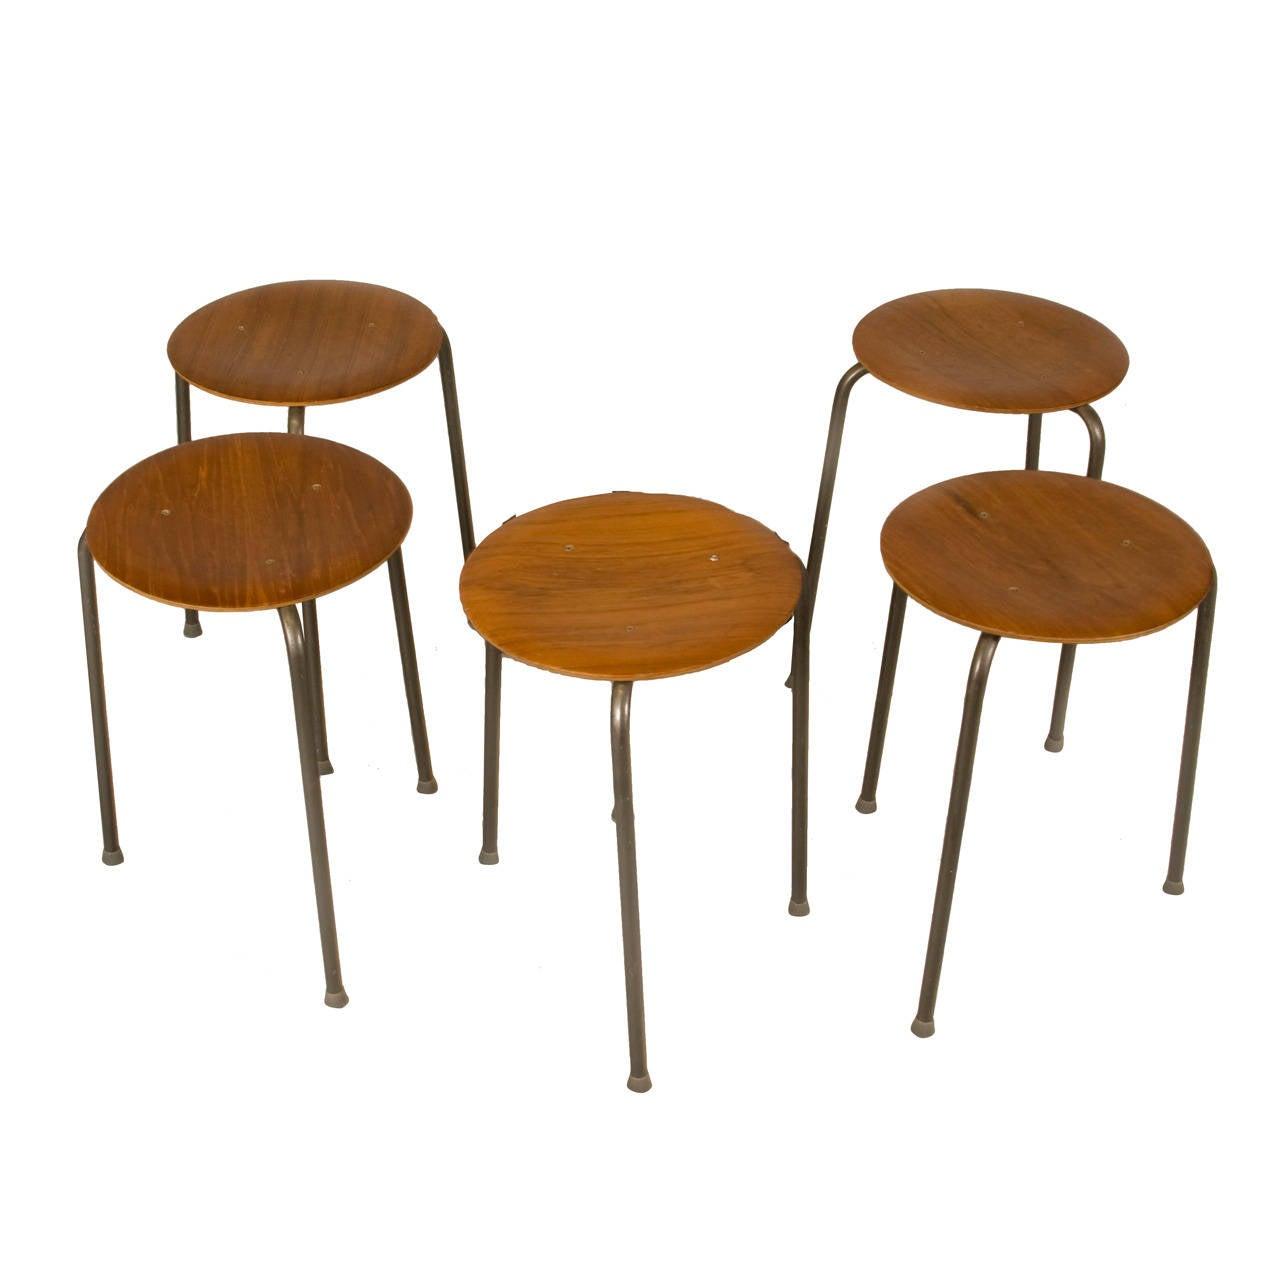 Early Set Of Arne Jacobsen Dot Stools At 1stdibs